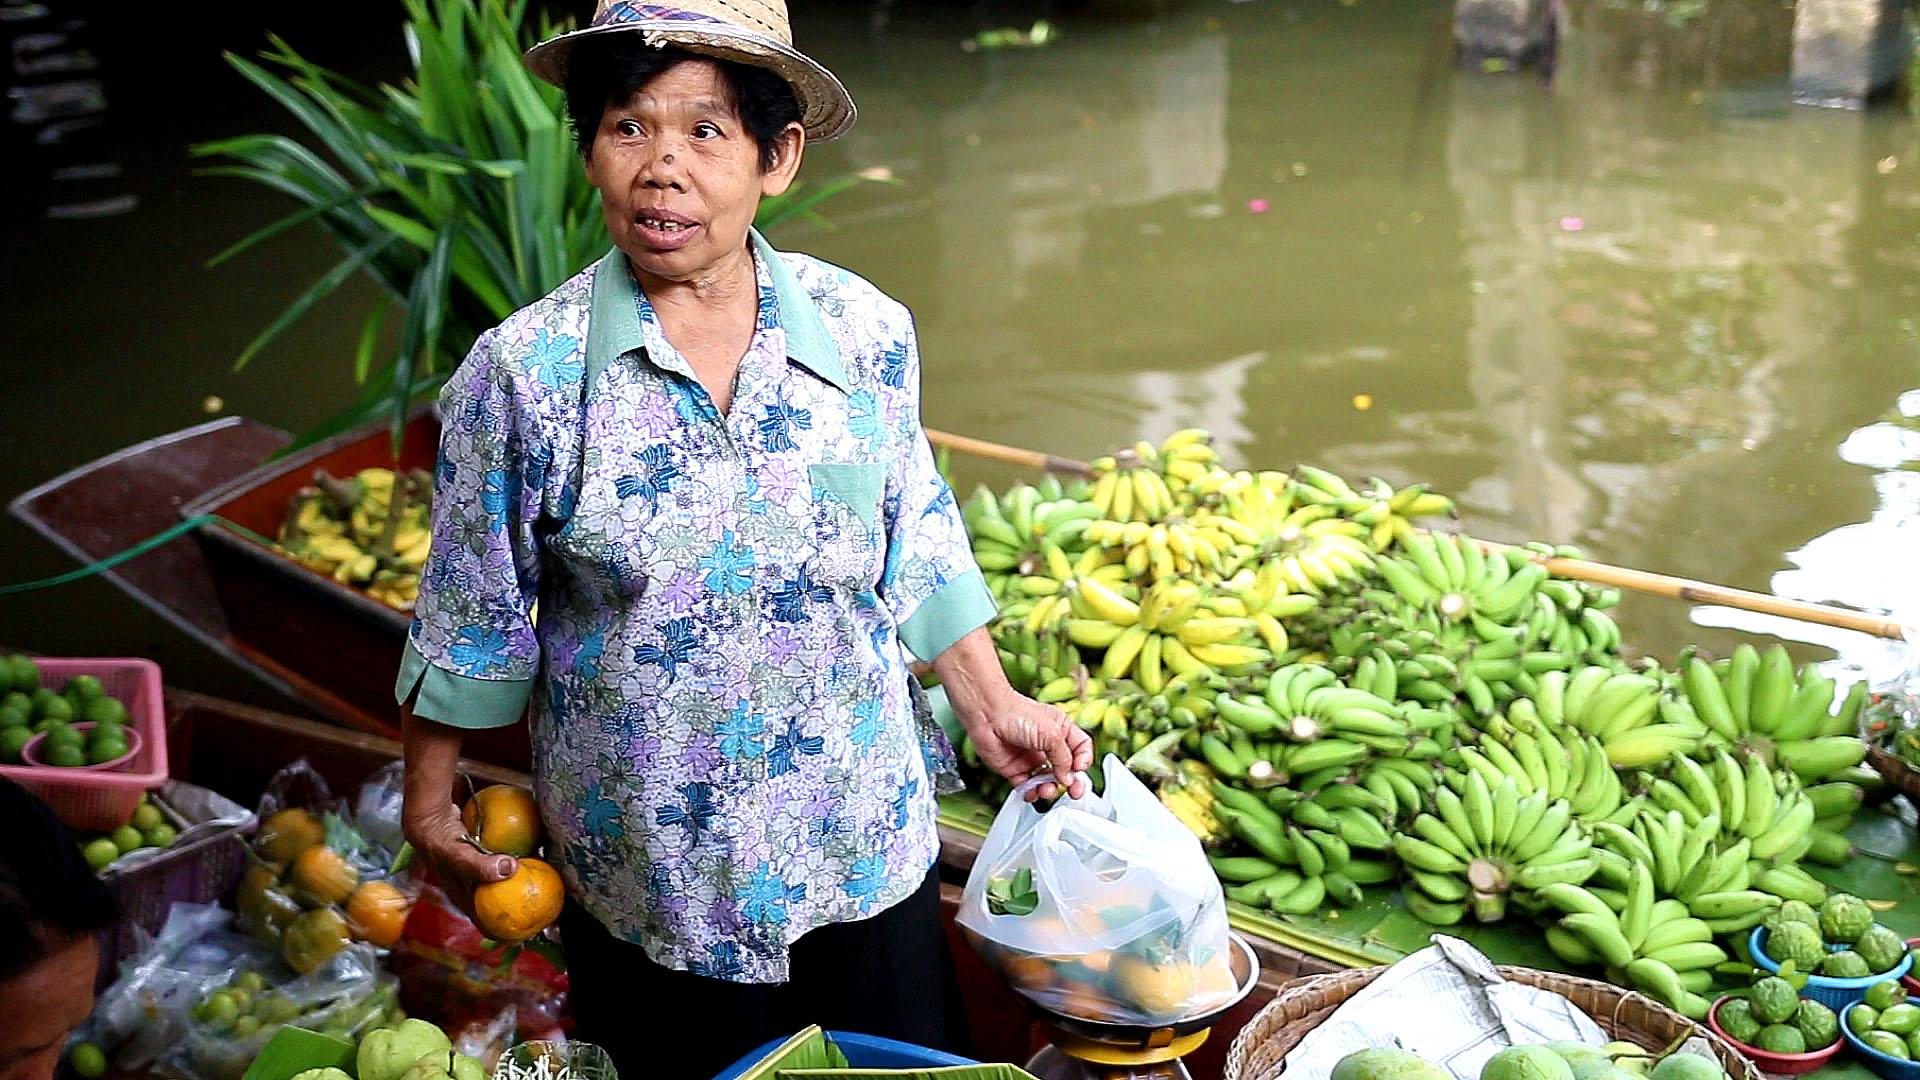 Khlong Lat Mayom, Thaïlande, Bangkok, vendeuse, marché flottant